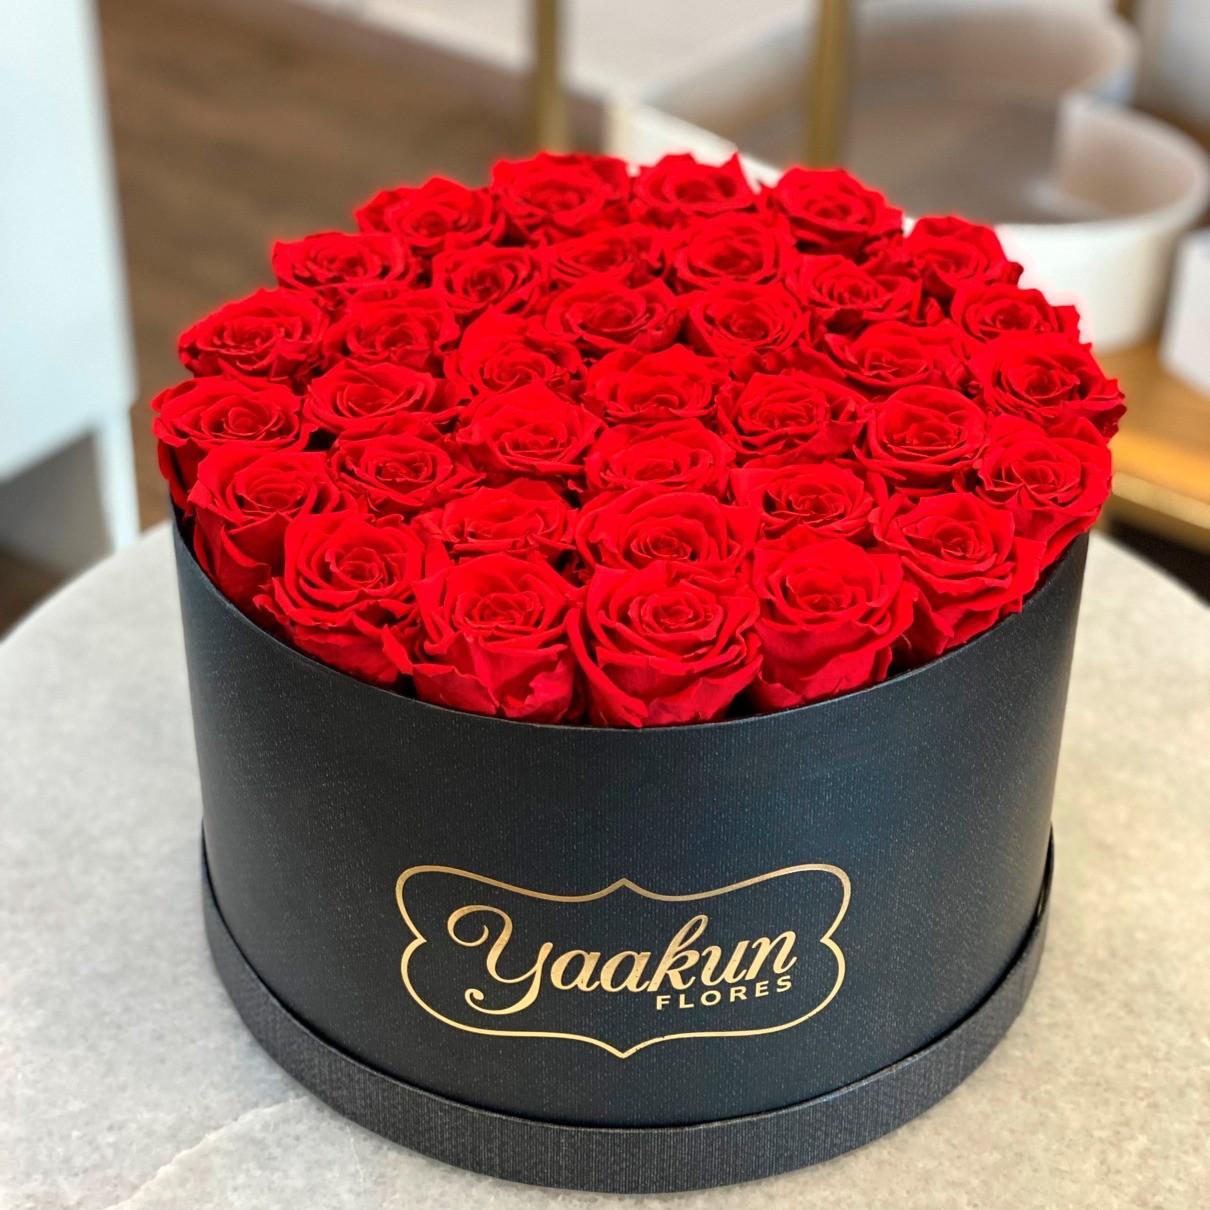 Rosas eternas en caja negra circular rosas rojas